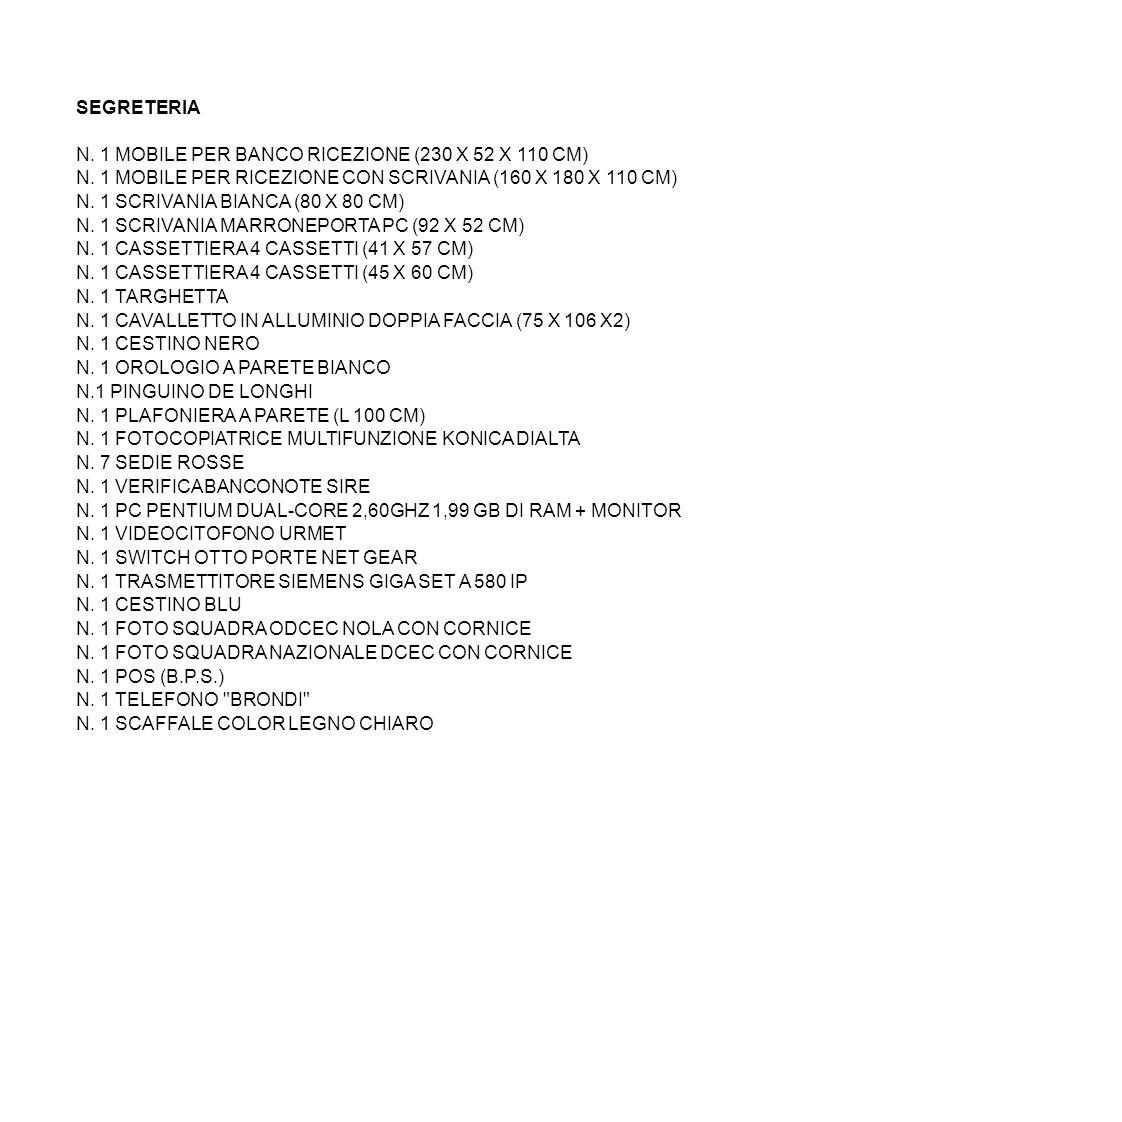 SEGRETERIA N. 1 MOBILE PER BANCO RICEZIONE (230 X 52 X 110 CM) N. 1 MOBILE PER RICEZIONE CON SCRIVANIA (160 X 180 X 110 CM) N. 1 SCRIVANIA BIANCA (80